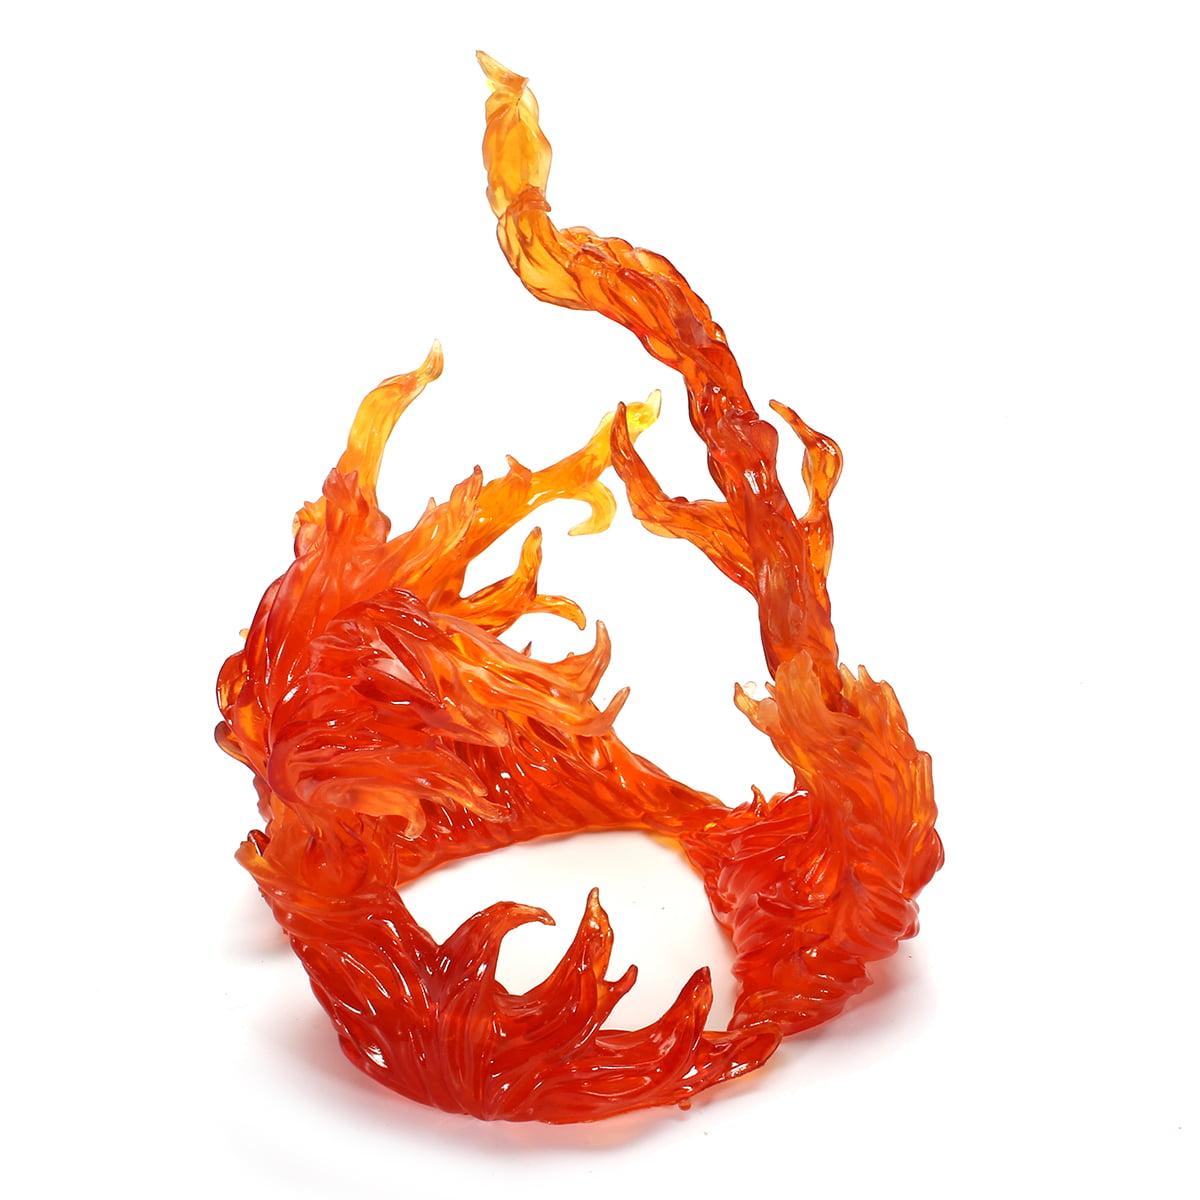 Star Soul Burning Flame Effect red color for Bandai Saint Seiya Gundam One piece